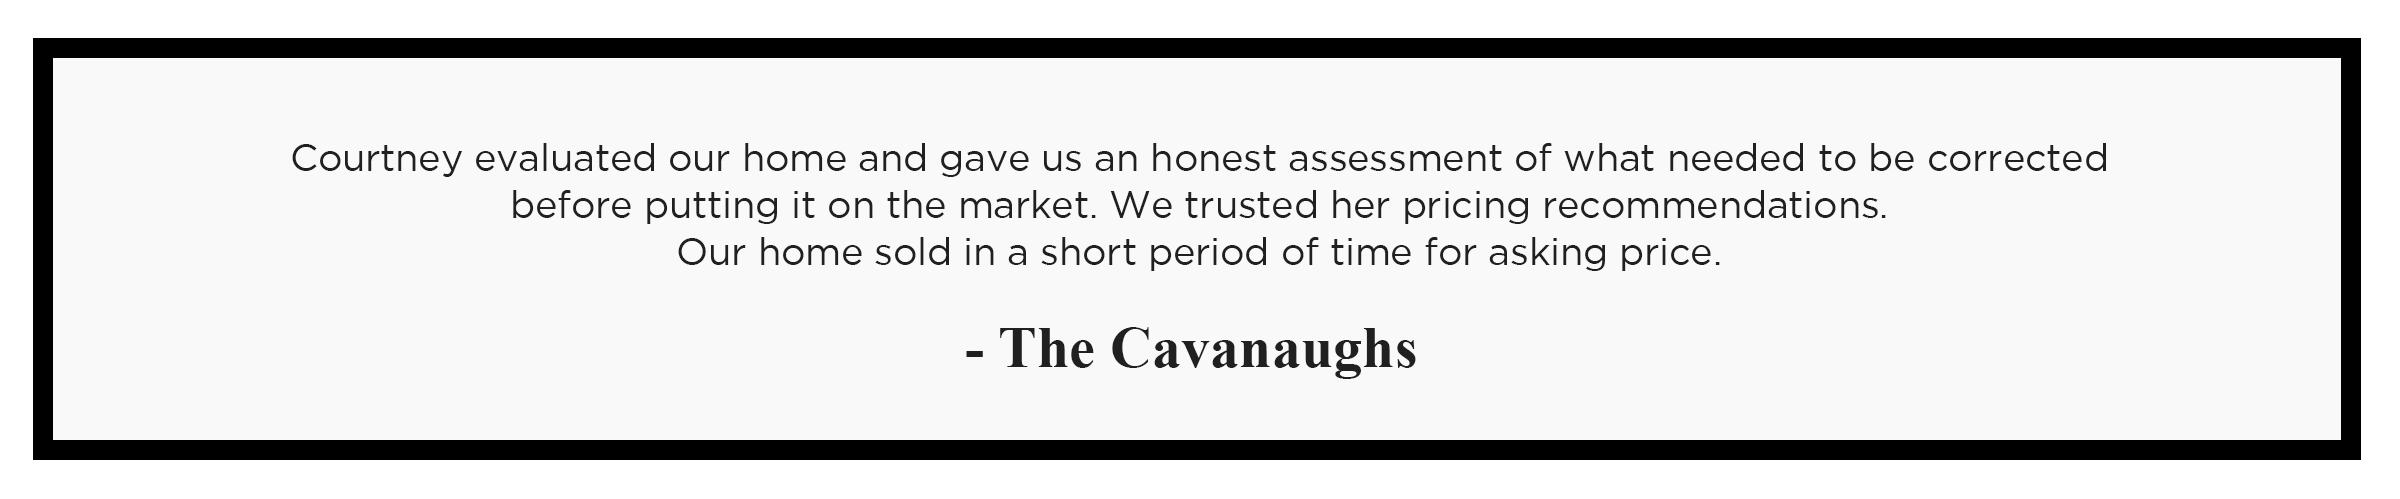 03 - the cavanaughs